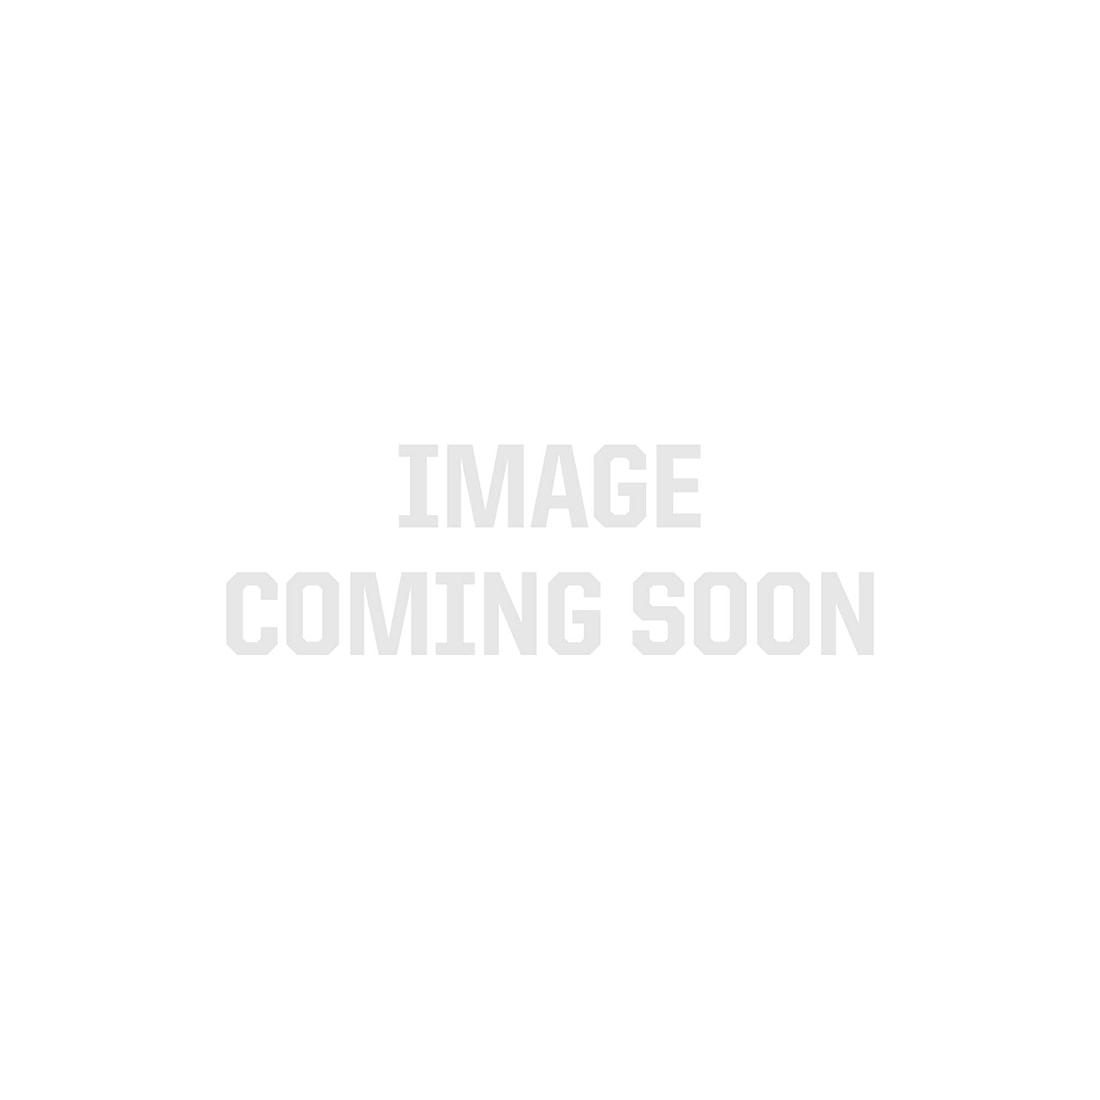 TruColor 2835 CurrentControl LED Strip Light - 3,000K - 80/m - CurrentControl - 10m Reel